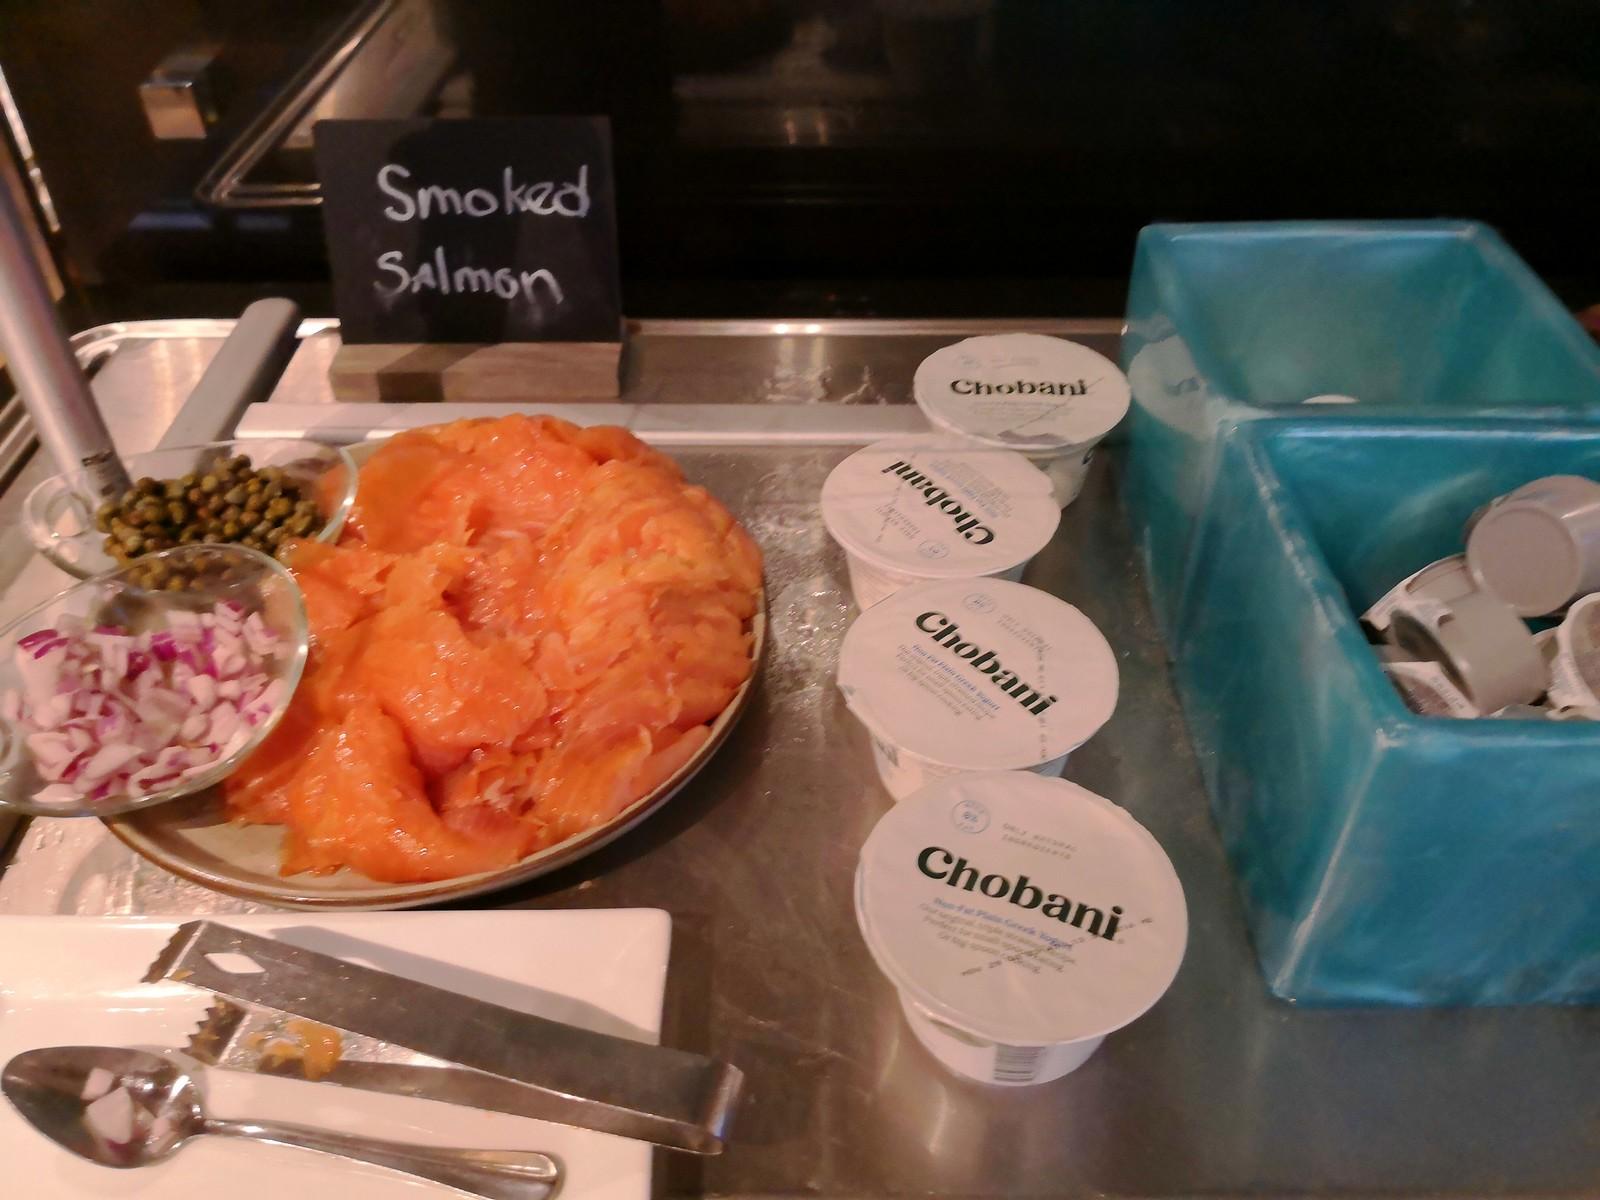 Smoked salmon and yogurt